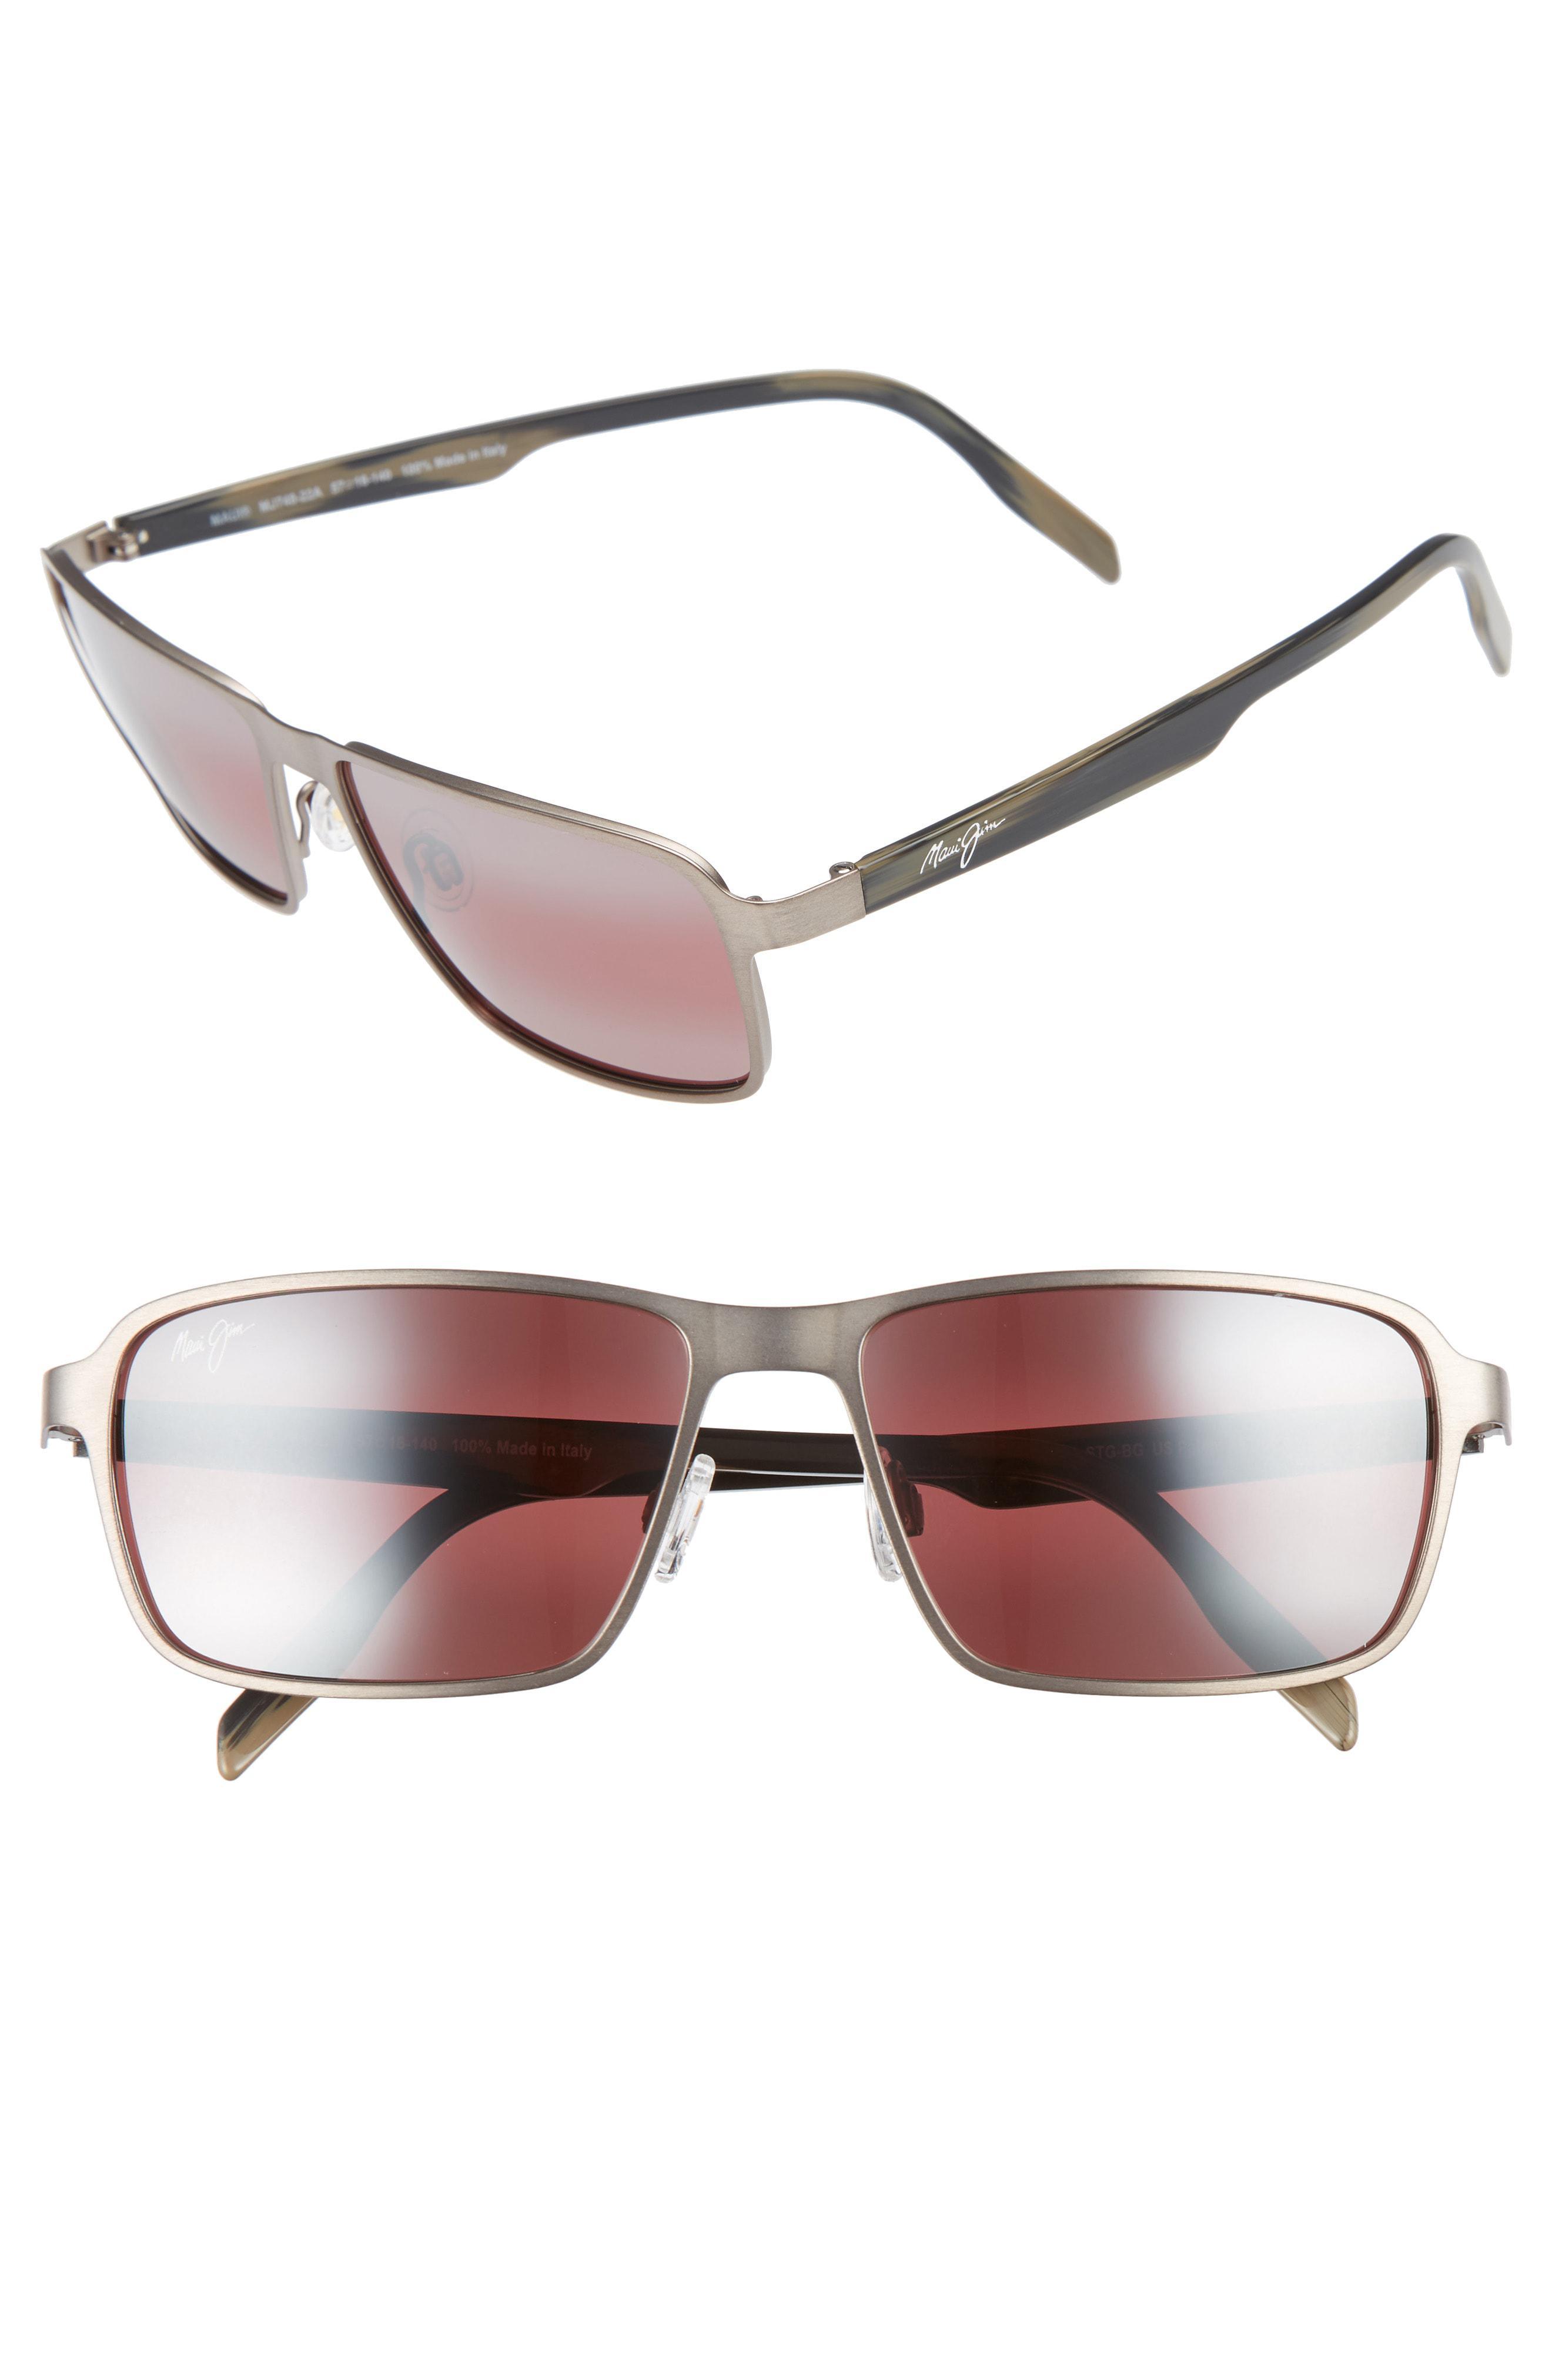 040676cf7bb Lyst - Maui Jim Glass Beach Polarizedplus2 54mm Sunglasses - Brushed ...